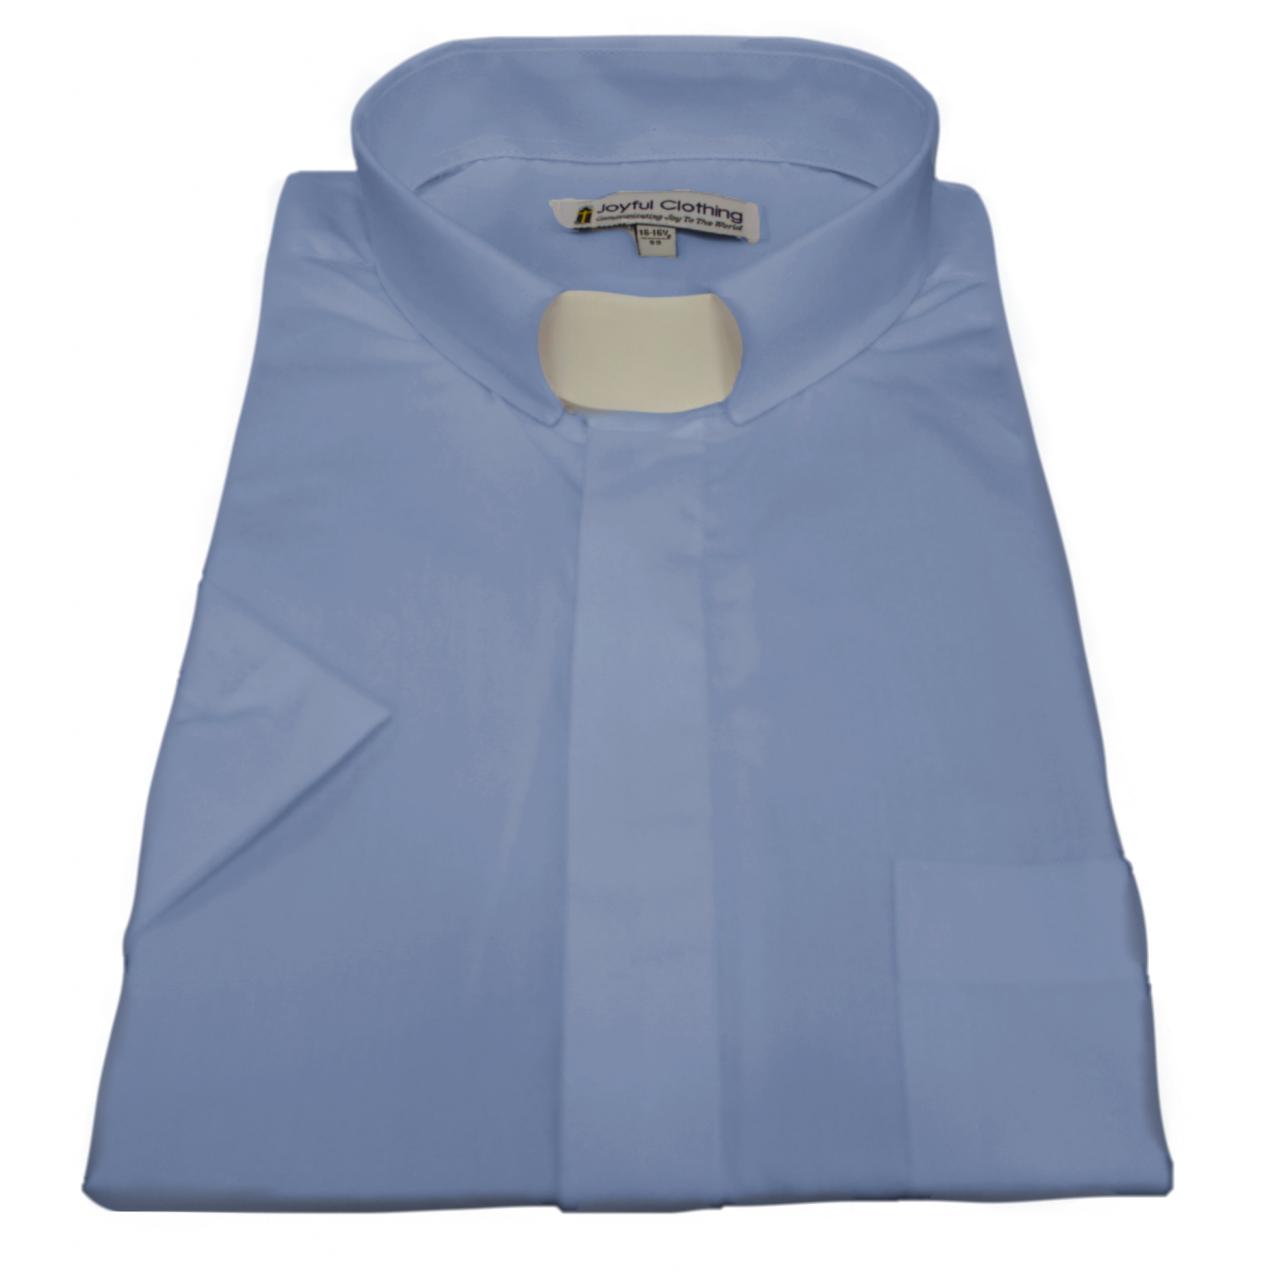 163. Men's Short-Sleeve Tab-Collar Clergy Shirt - Light Blue